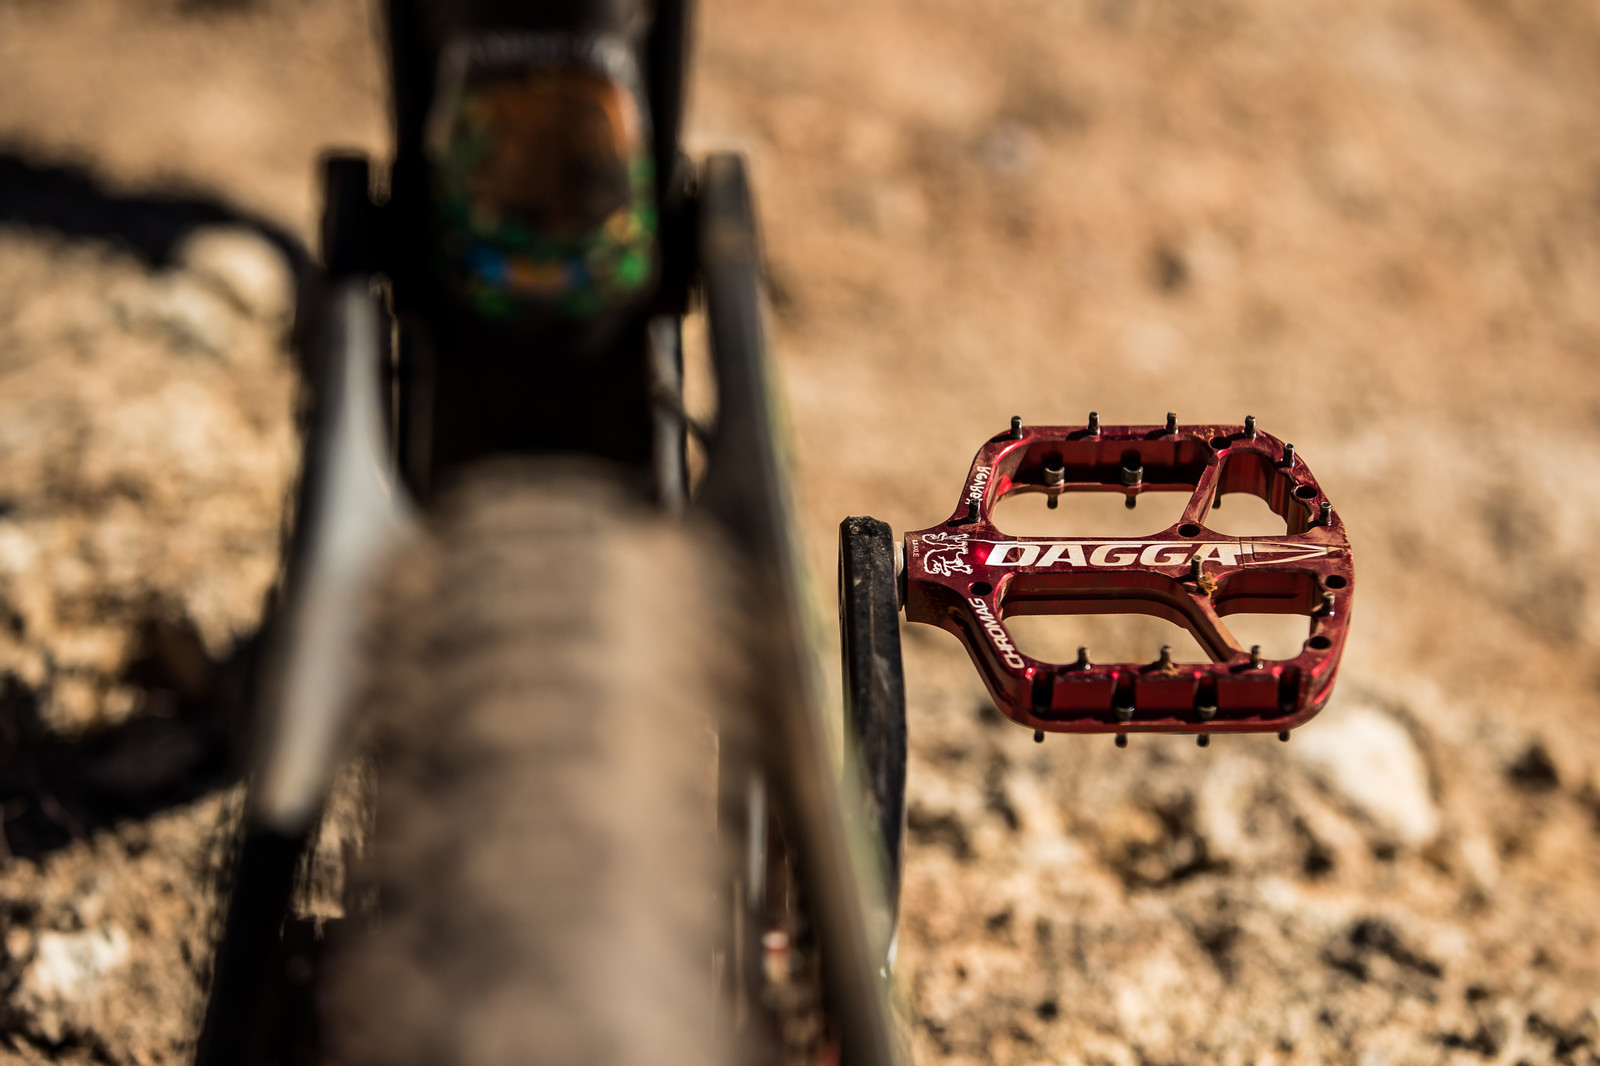 Shin Slicers on Juan Diego Salido's Transition TR11 at Rampage 2019 - RAMPAGE BIKE - Juan Diego Salido's Transition TR11 - Mountain Biking Pictures - Vital MTB